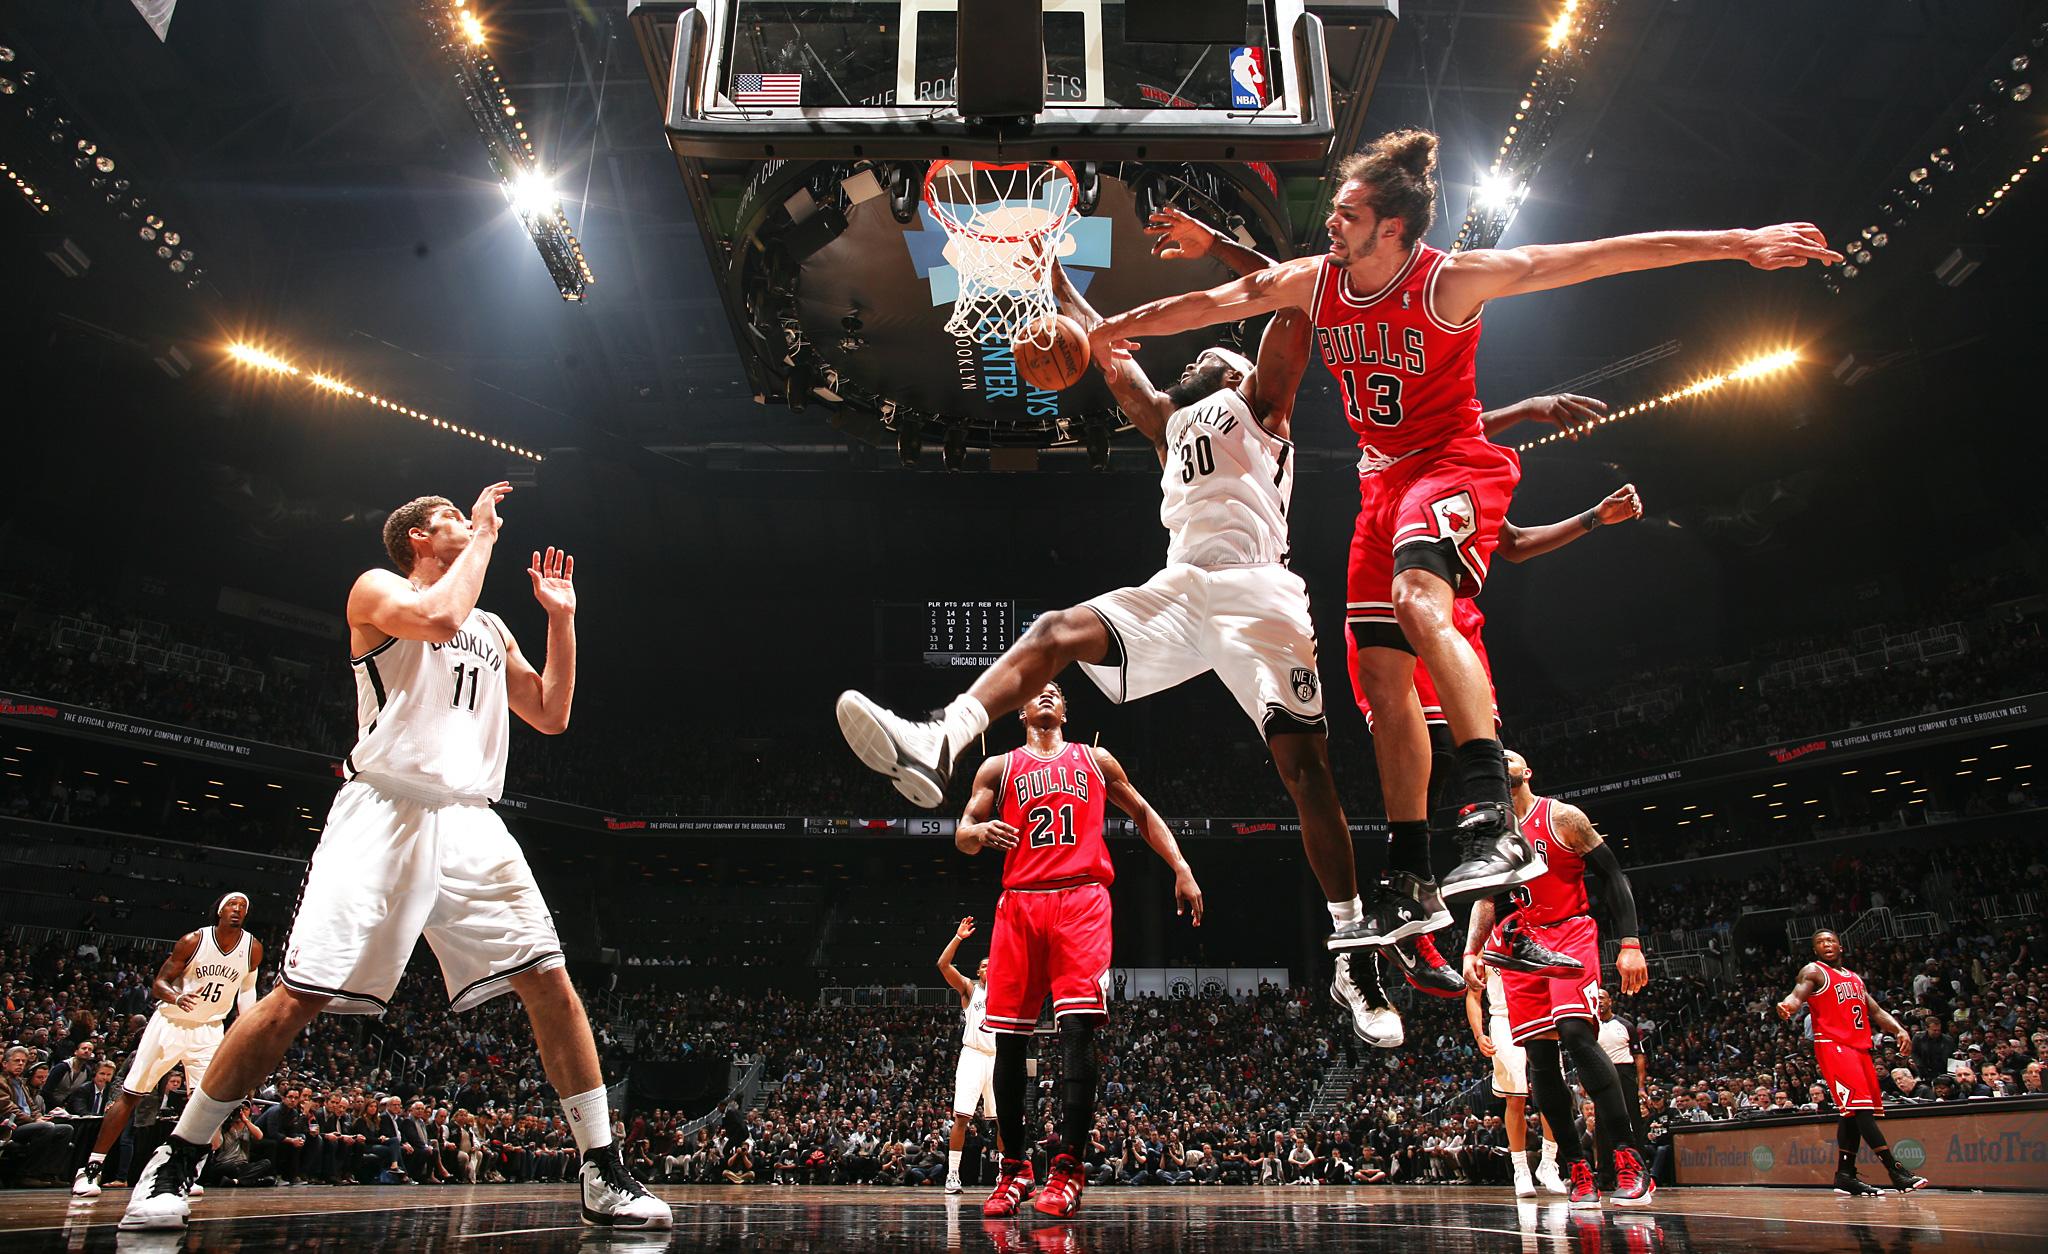 Hd Air Jordan Wallpaper Mid Air Collision Monster Blocks Of The Nba Playoffs Espn